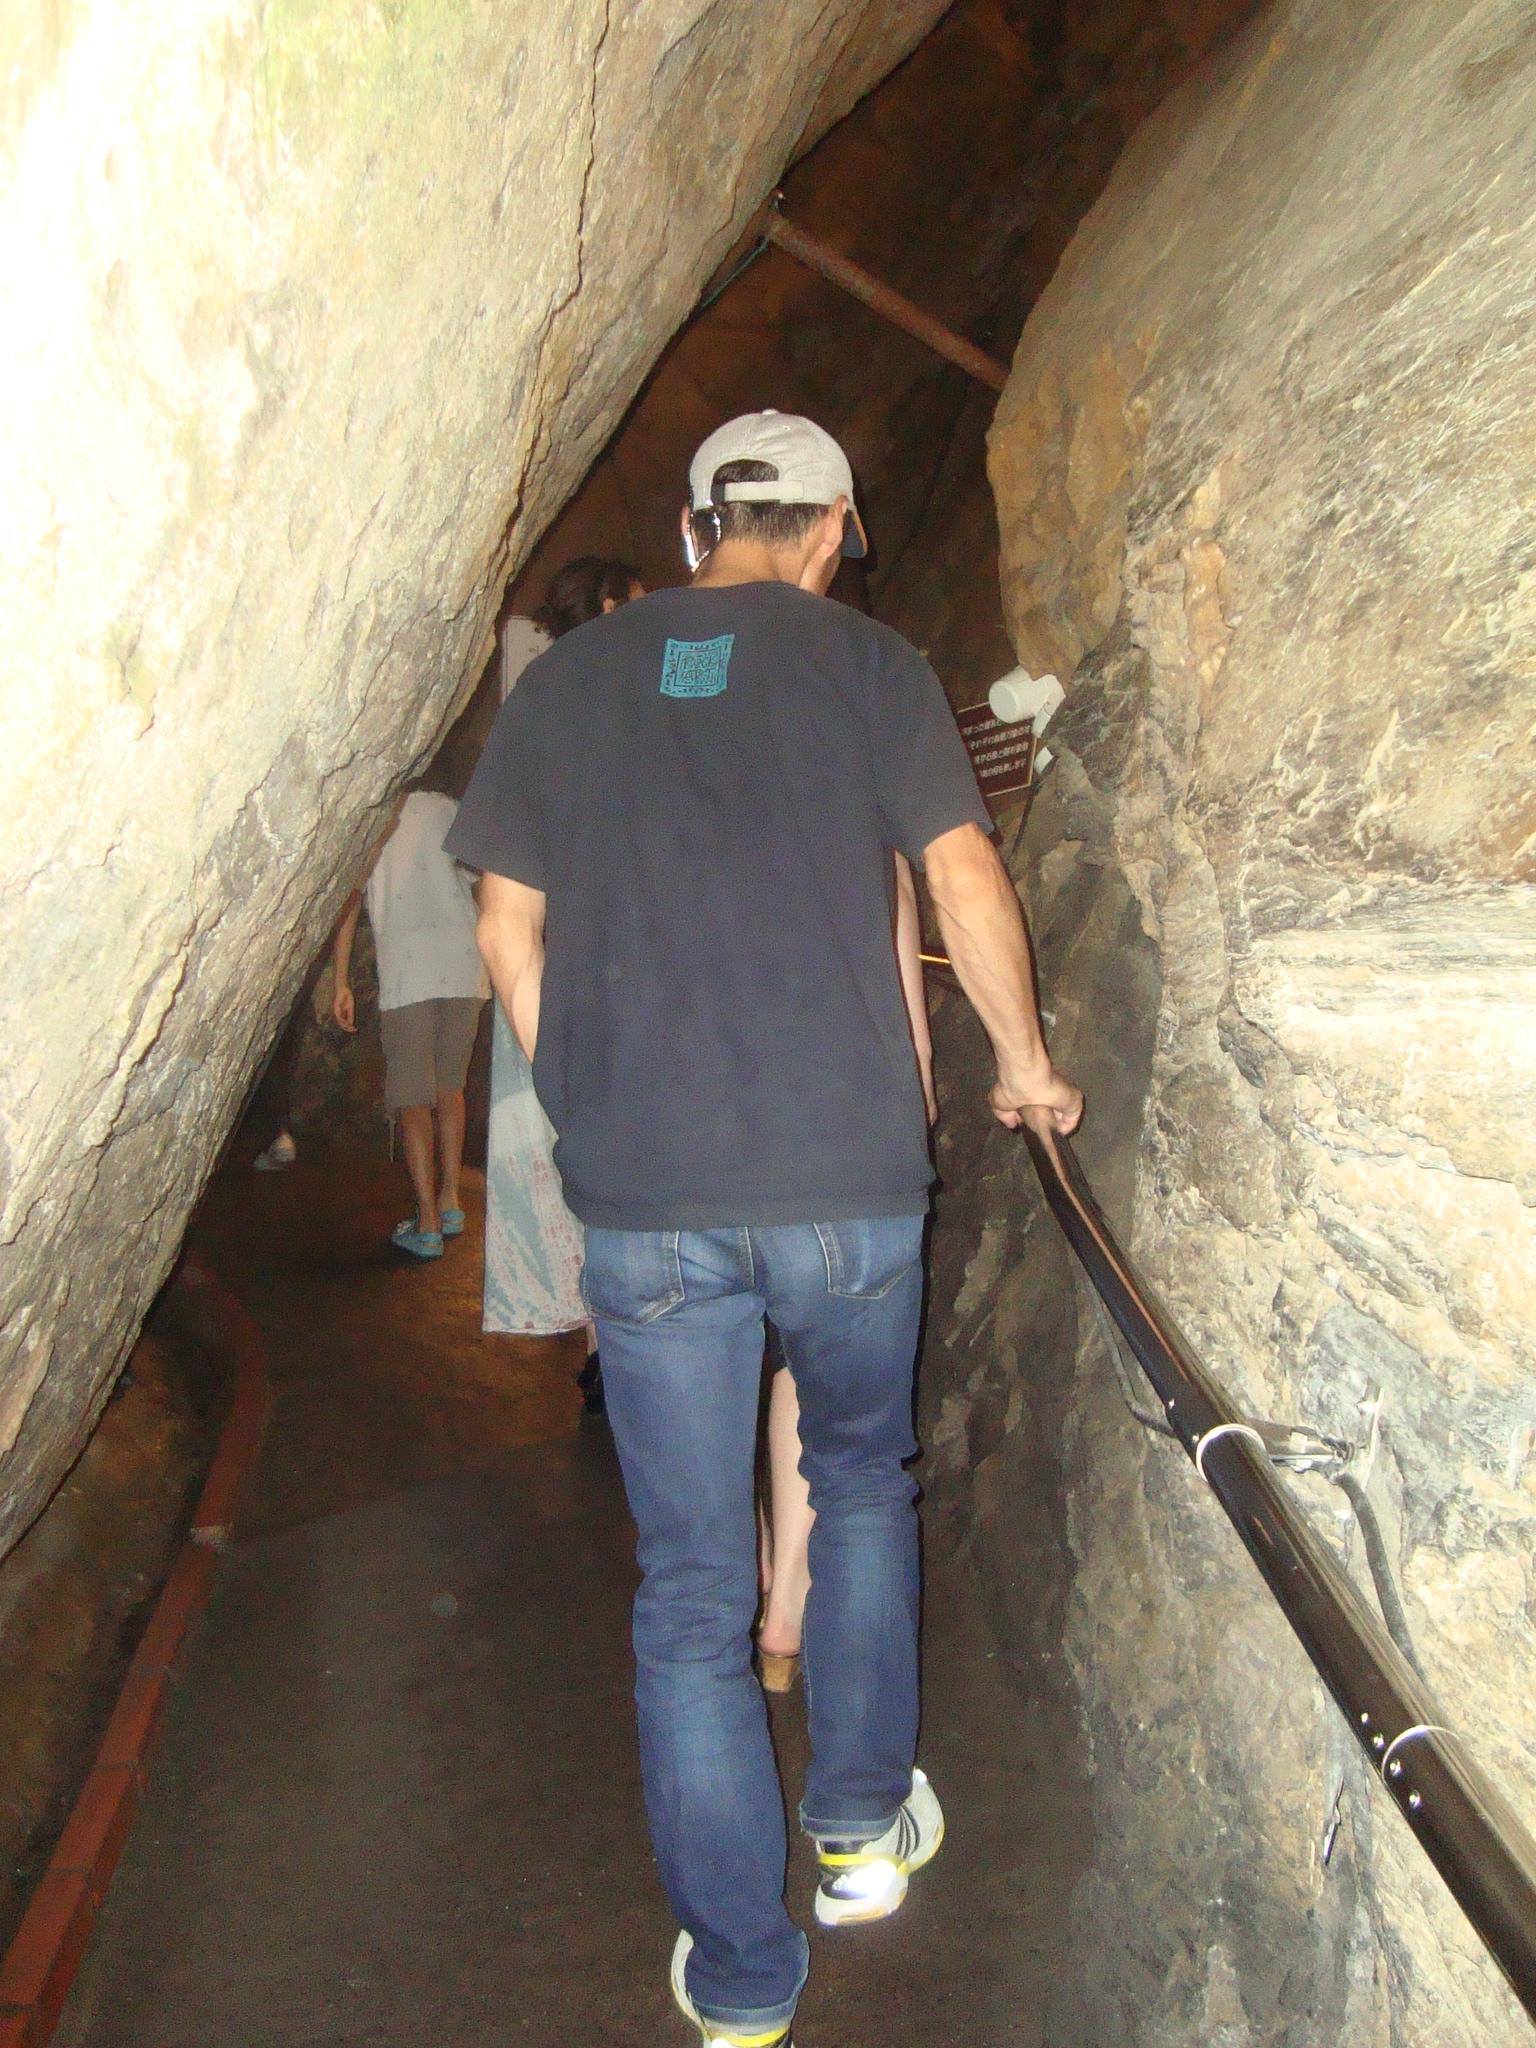 竜ヶ岩洞3.JPG